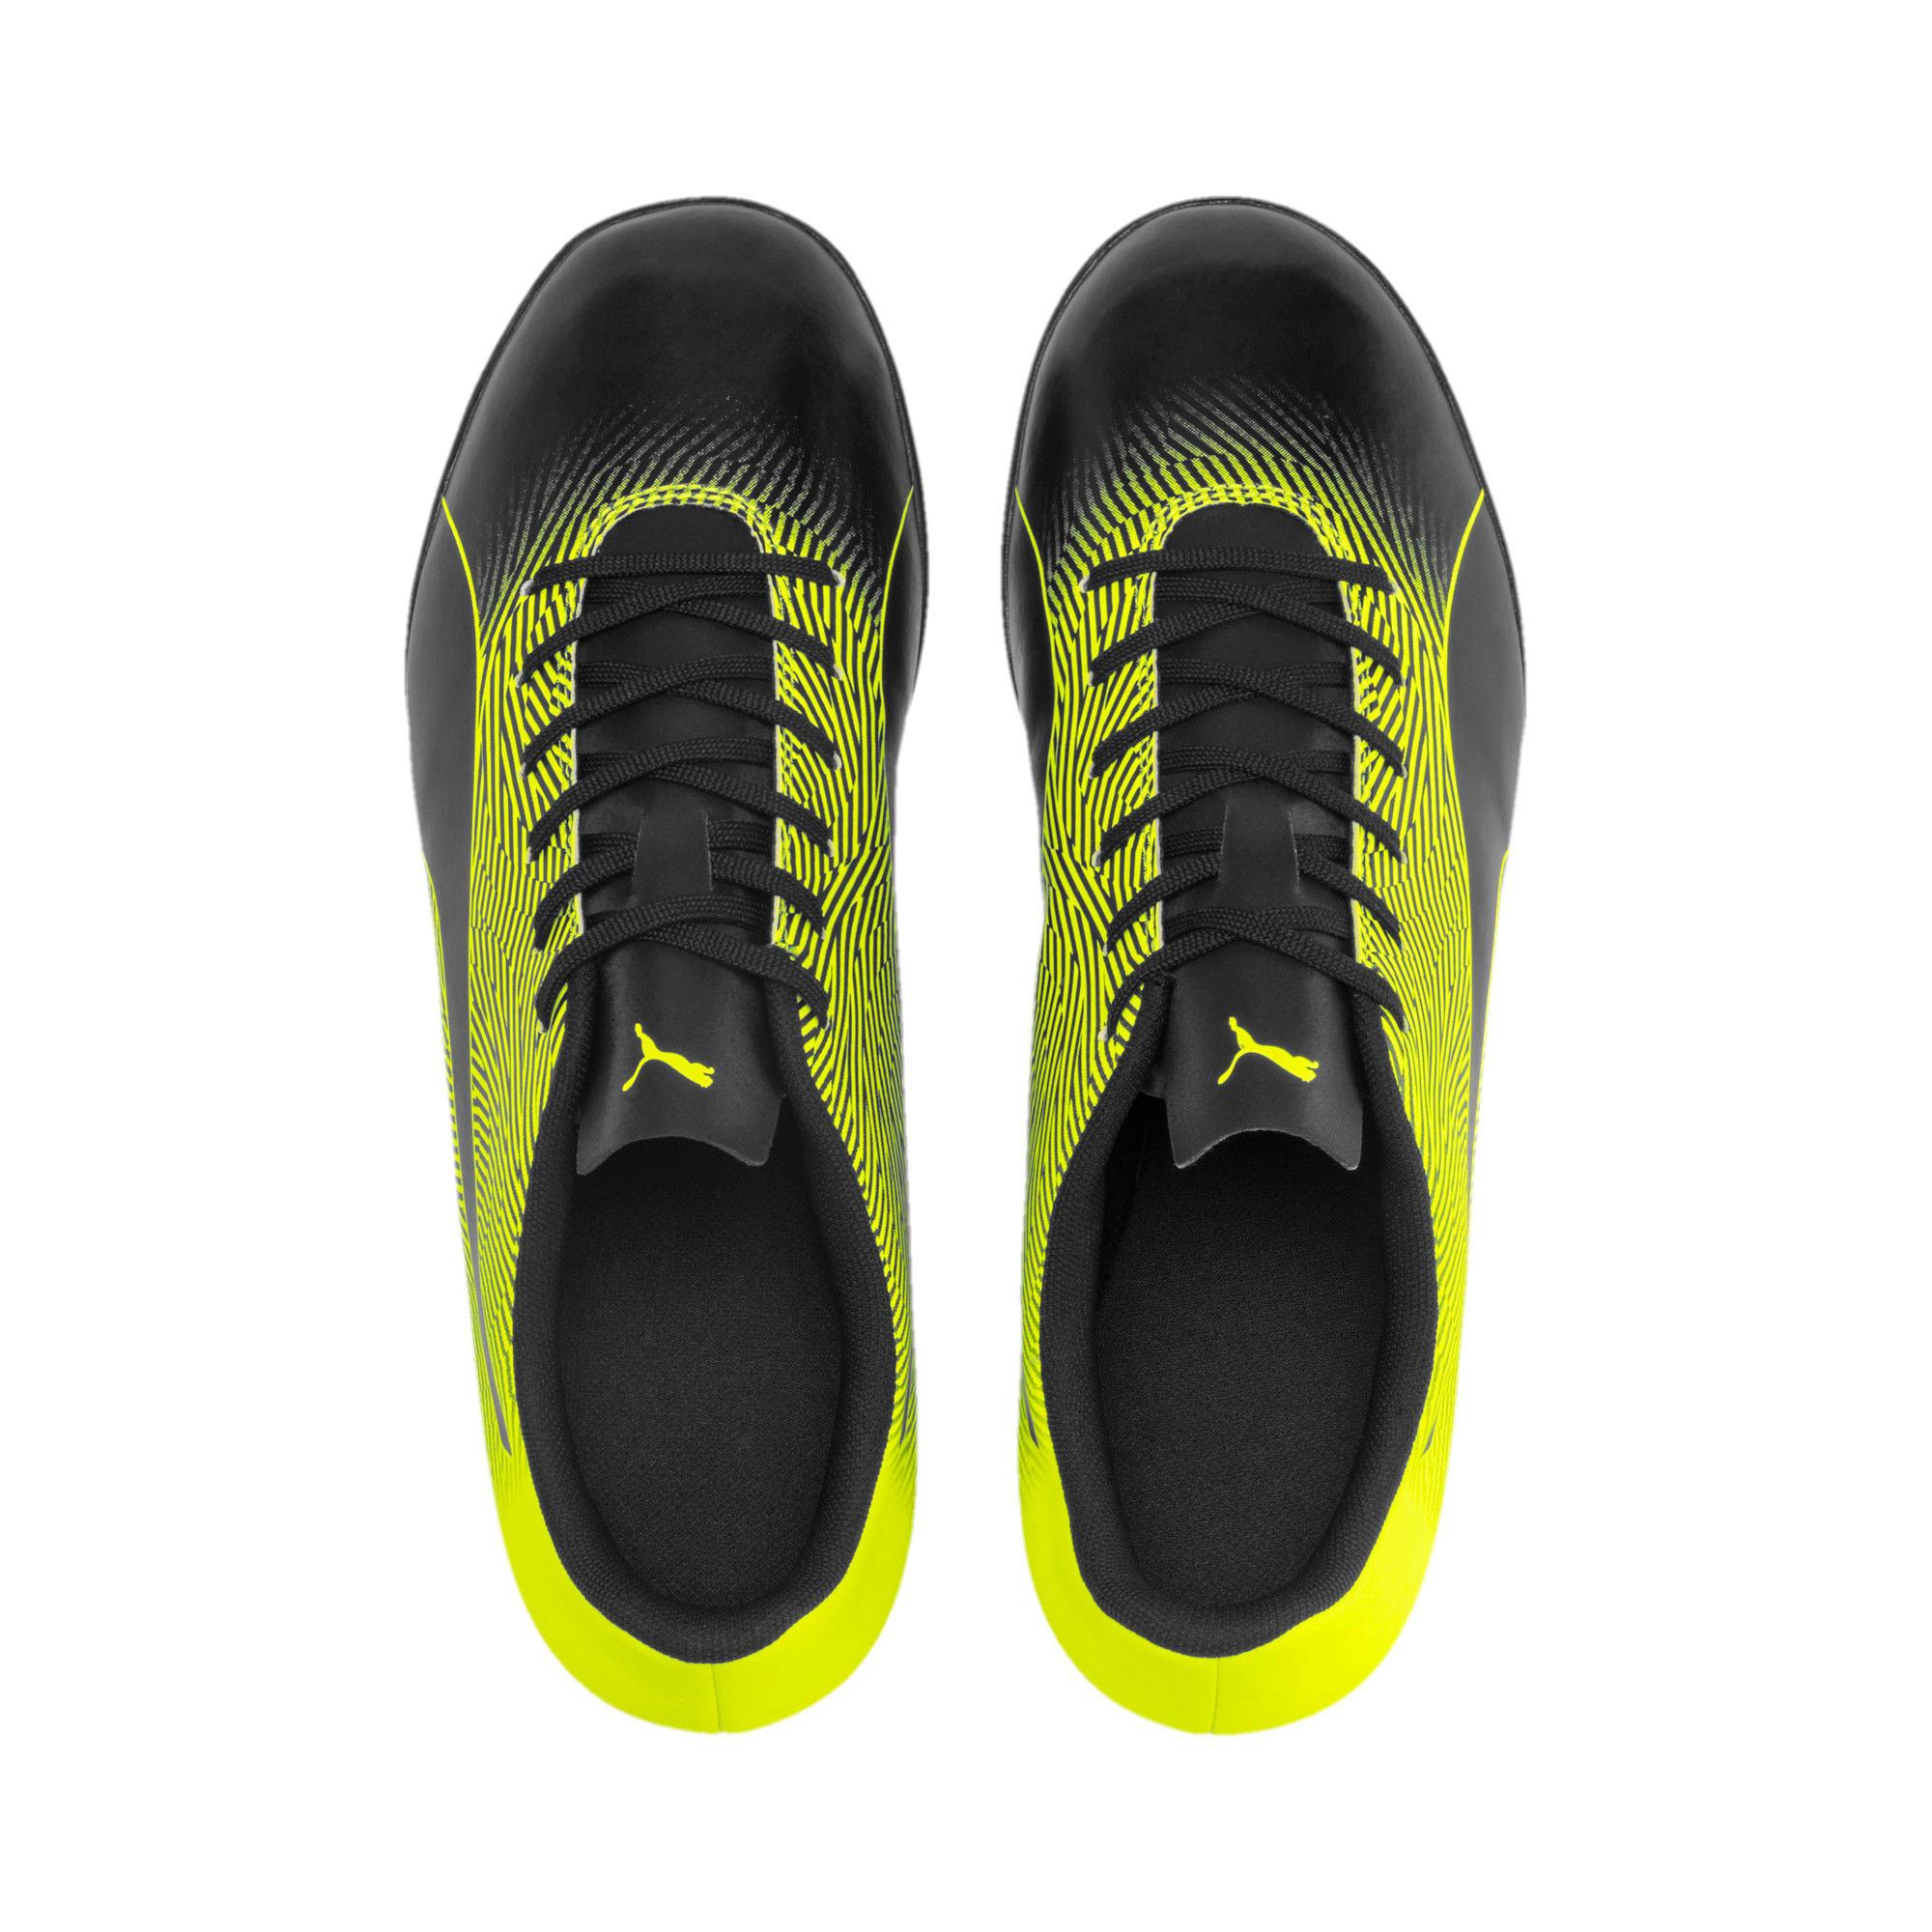 Thumbnail 7 of PUMA Spirit II TT Men's Soccer Shoes, Puma Black-Yellow Alert, medium